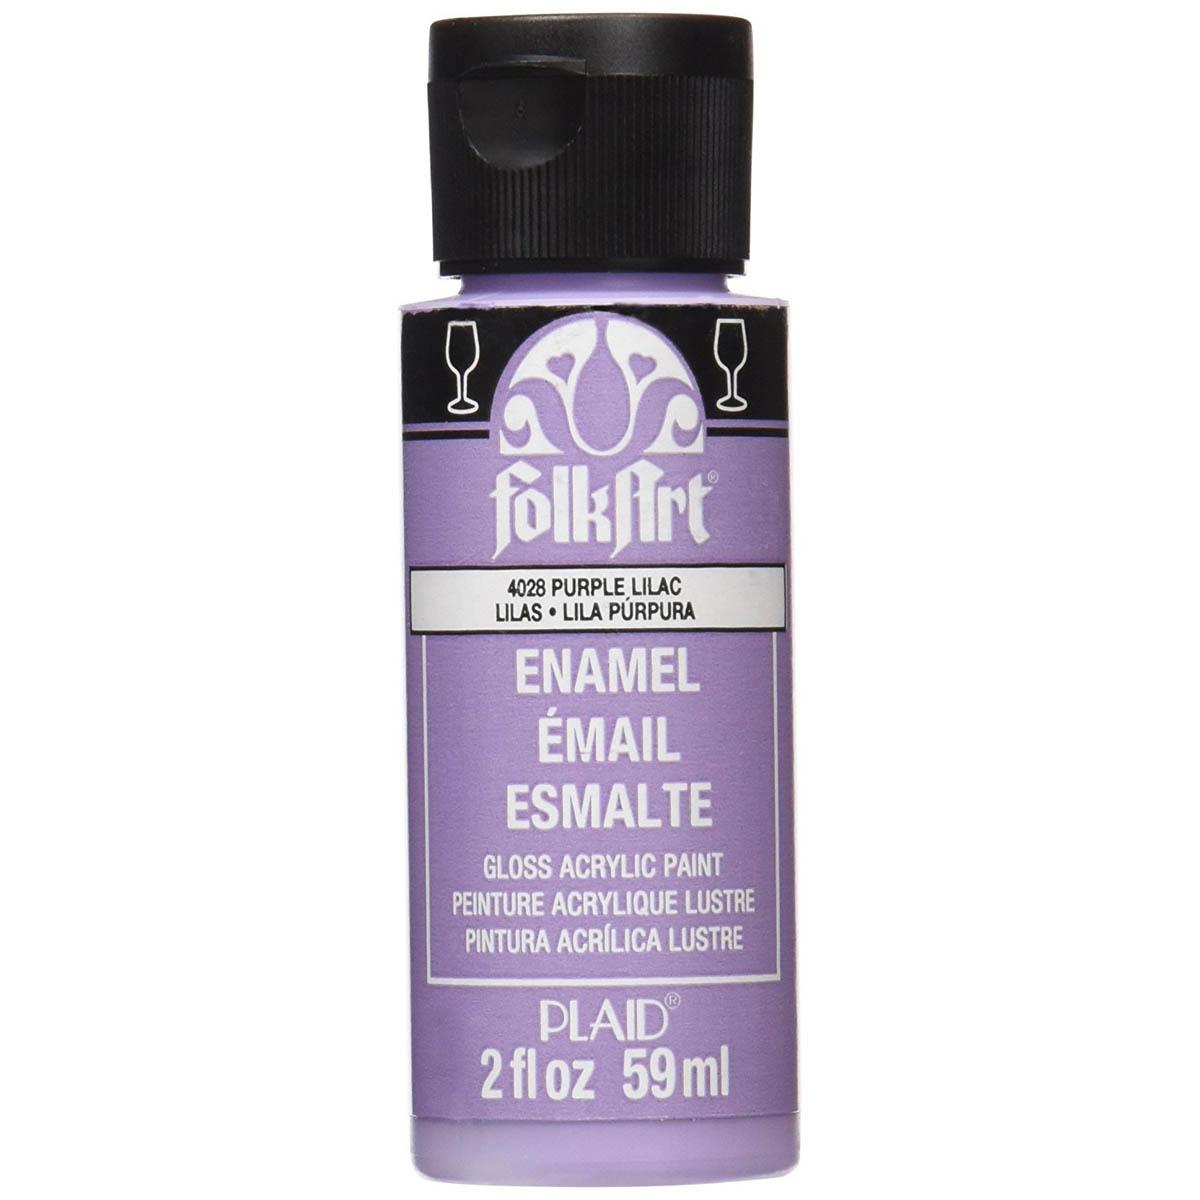 FolkArt ® Enamels™ - Purple Lilac, 2 oz. - 4028